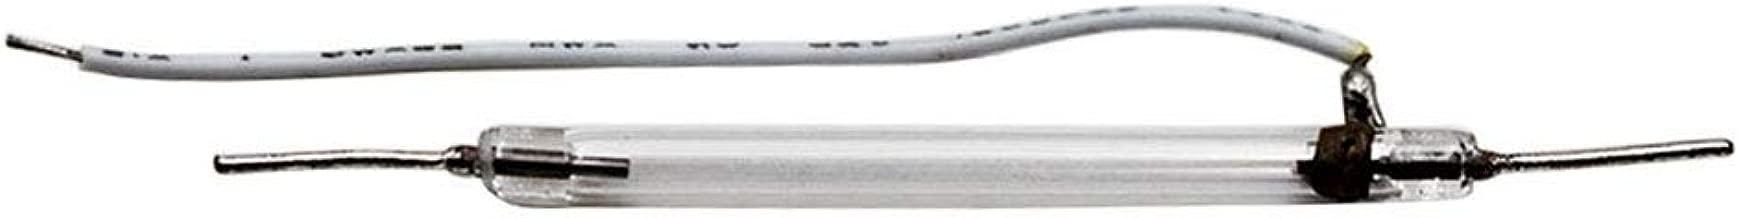 uirend Flash Tube Repair Accessories Replacement Xenon Lamp for Nikon SB600 SB-600